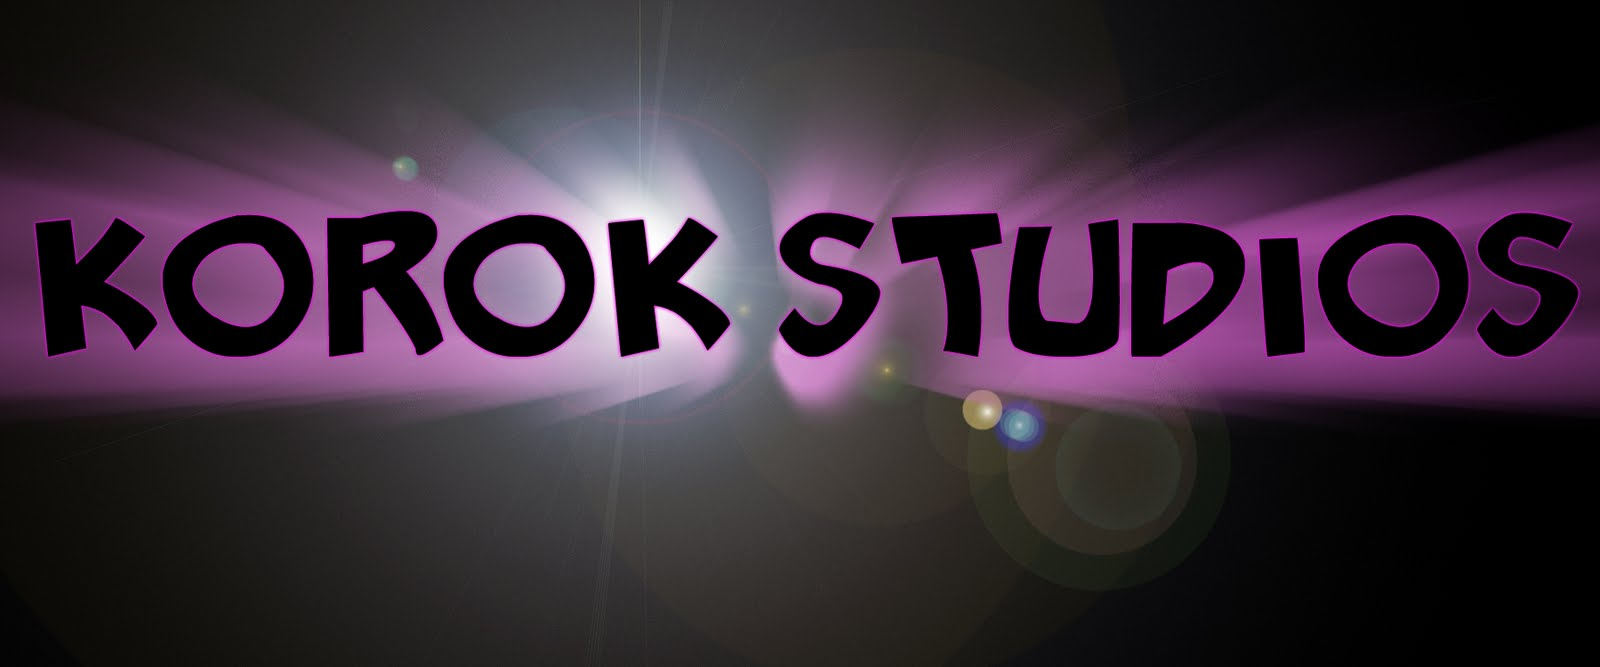 Korok Studios